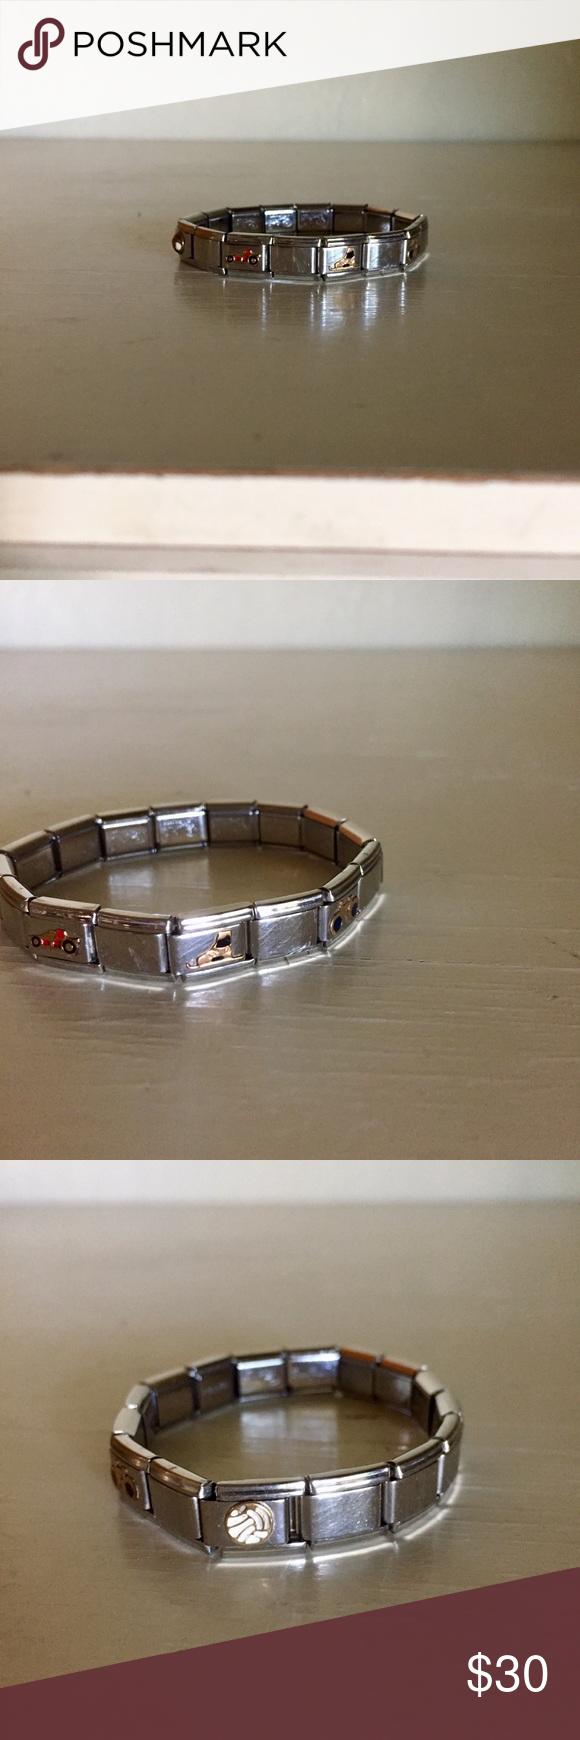 Sports Themed Italian Charm Bracelet